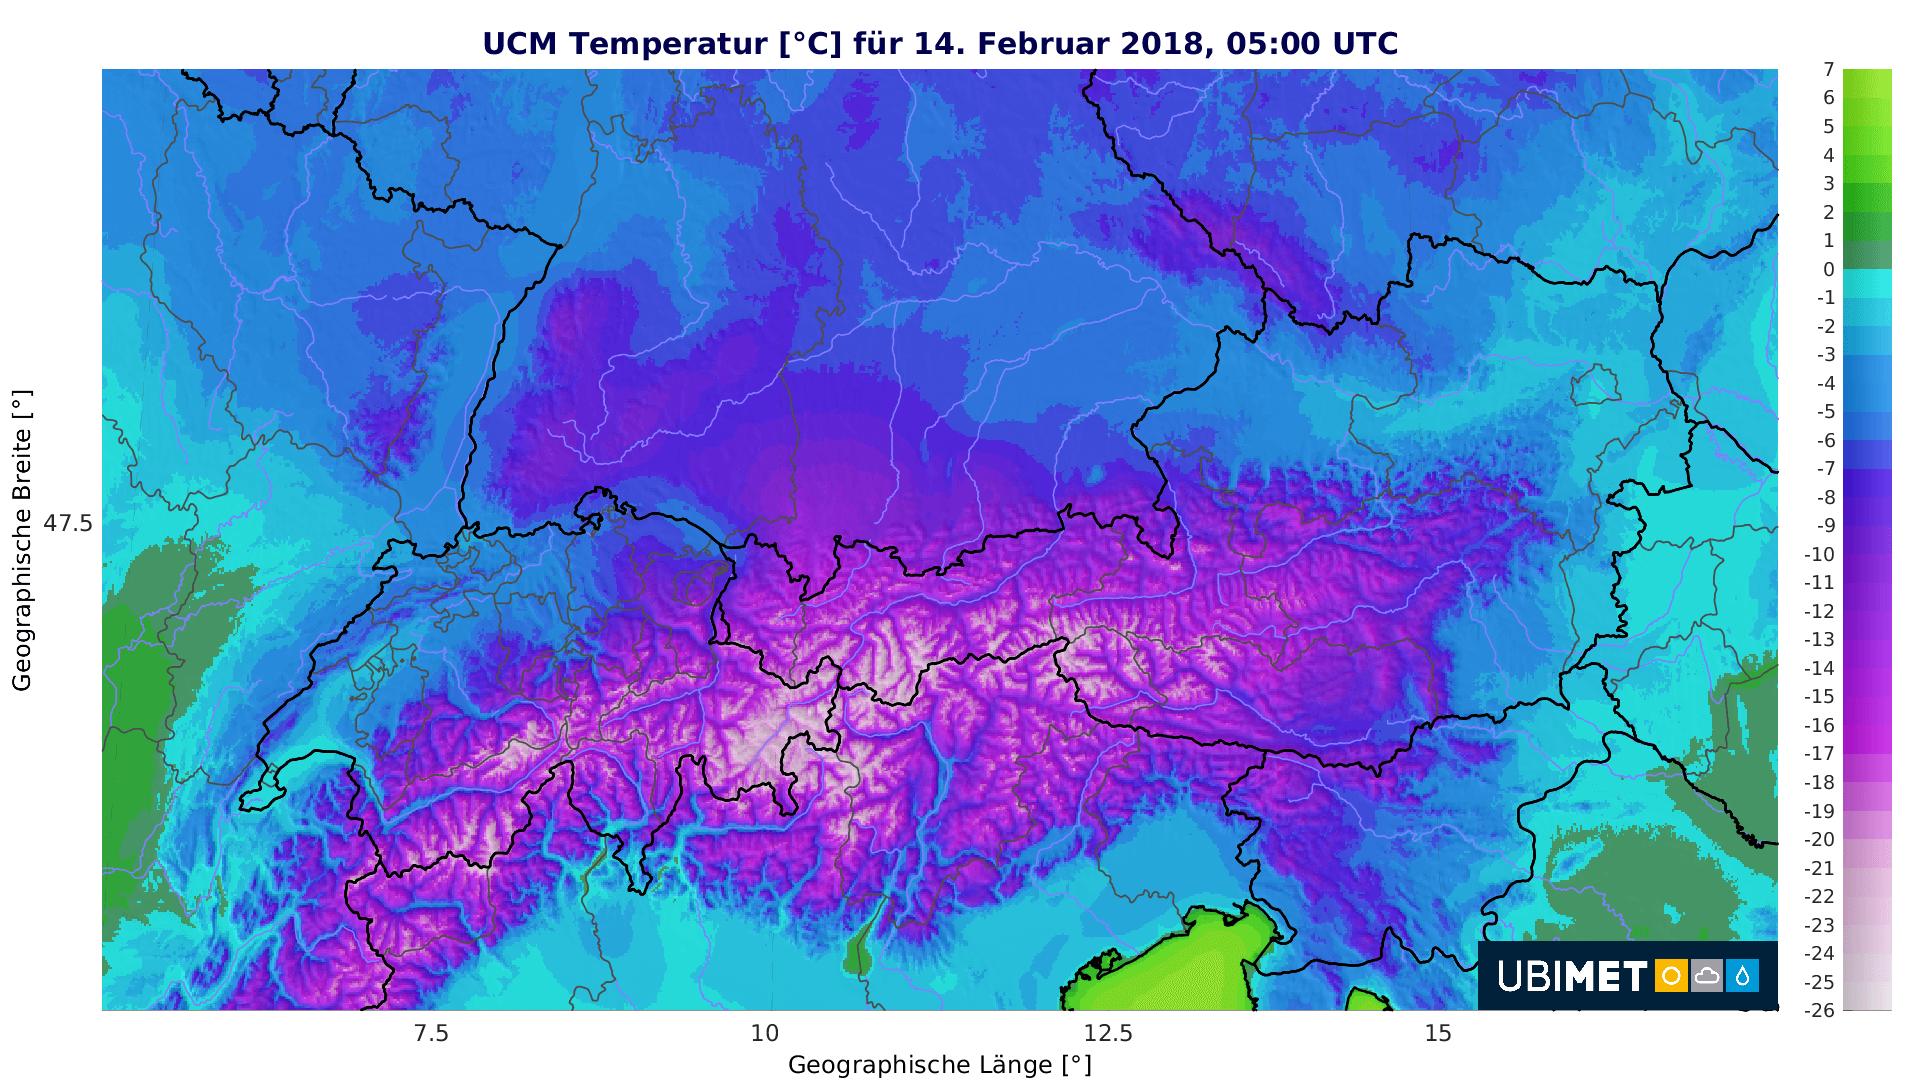 Eisige Temperaturen am Mittwochmorgen. © UBIMET